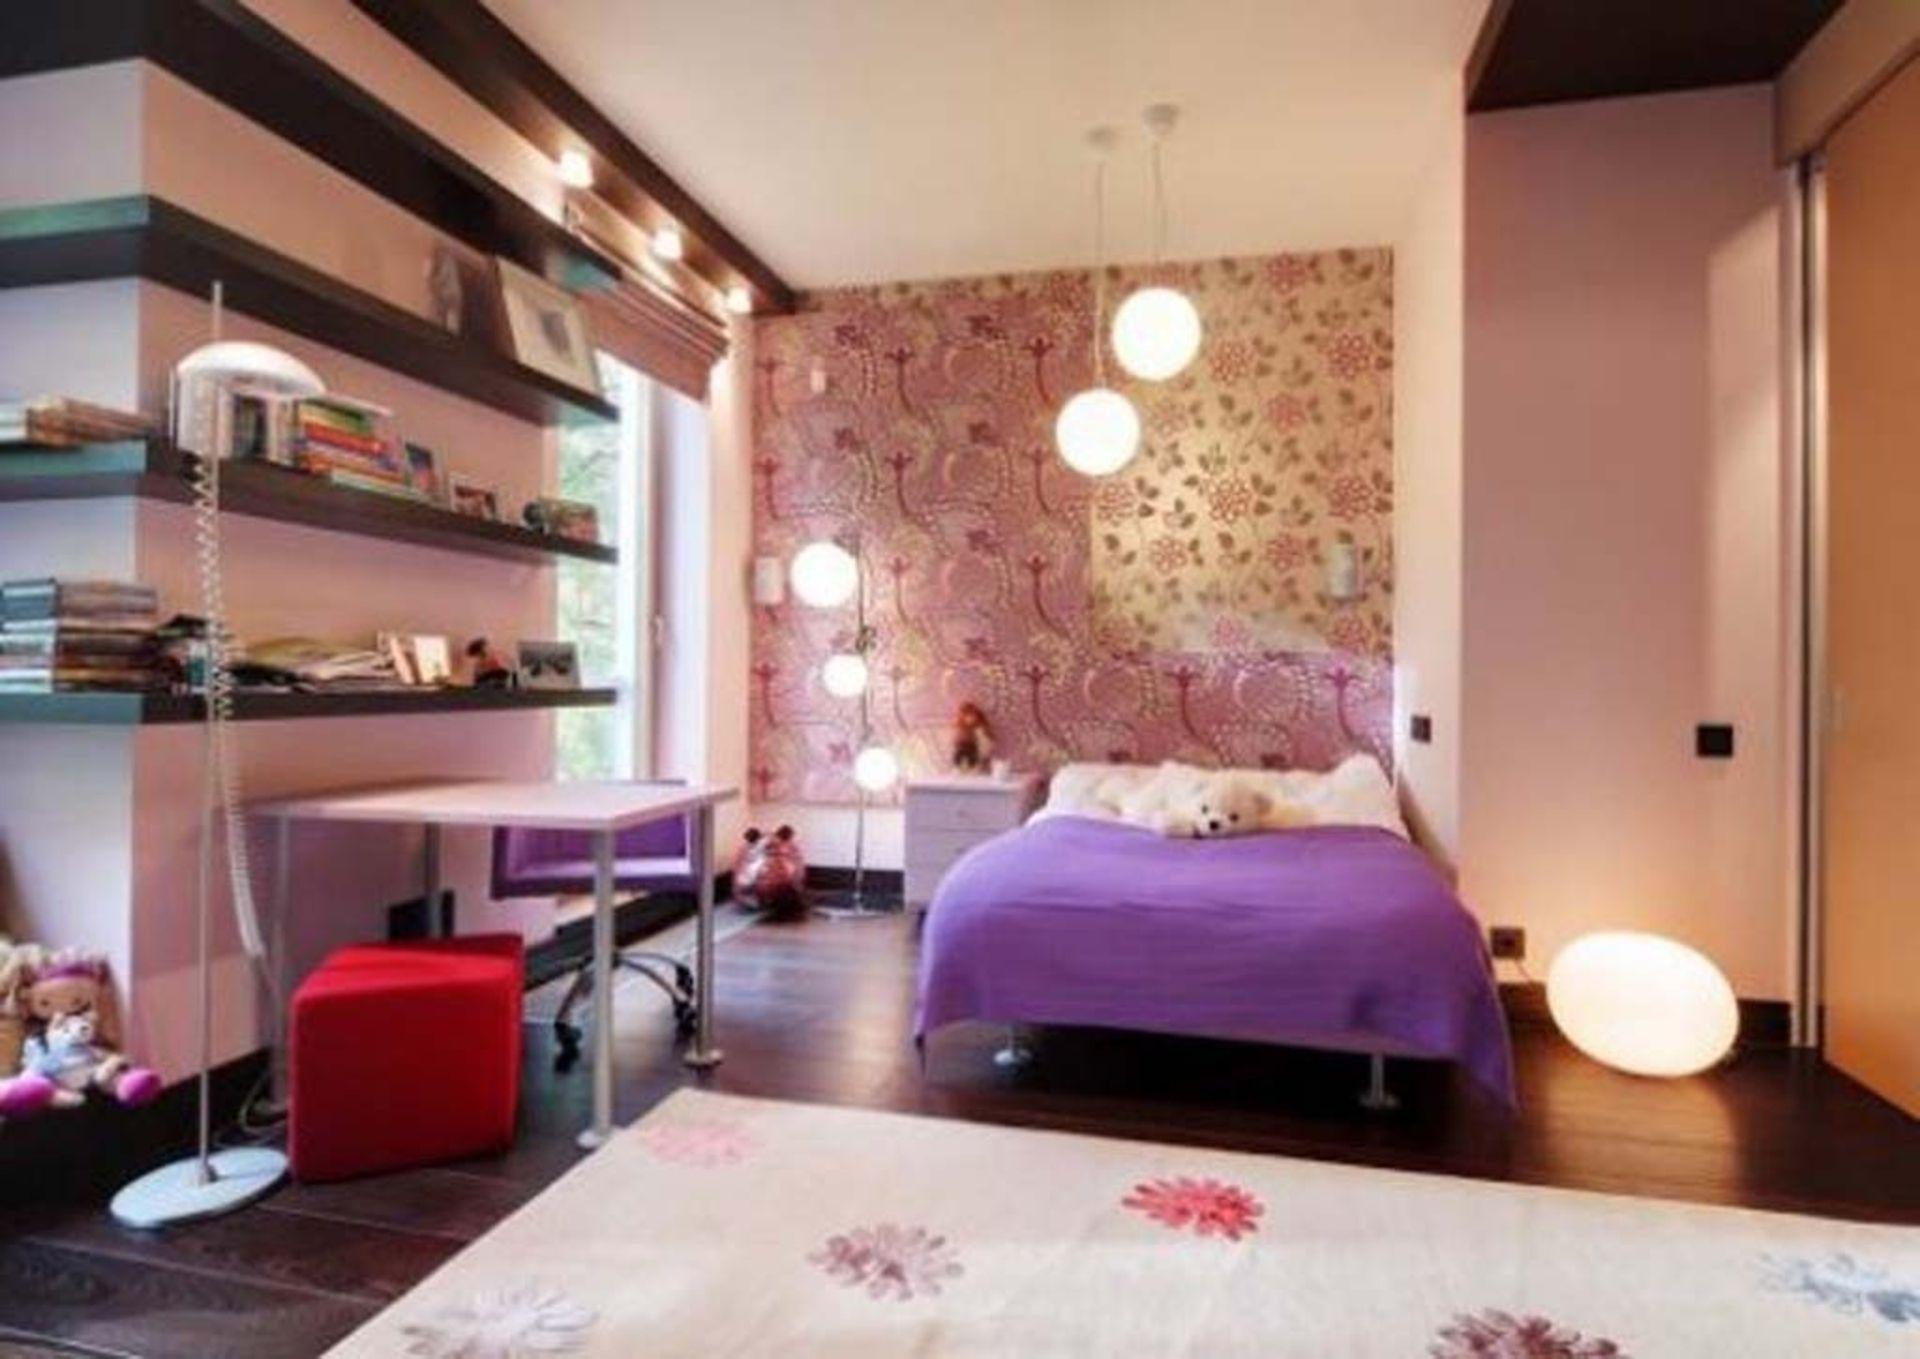 Pink Bedroom Designs For Adults Endearing Decorating Teenage Girl Bedroom Walls Decoseecom Girls Bedroom Design Inspiration